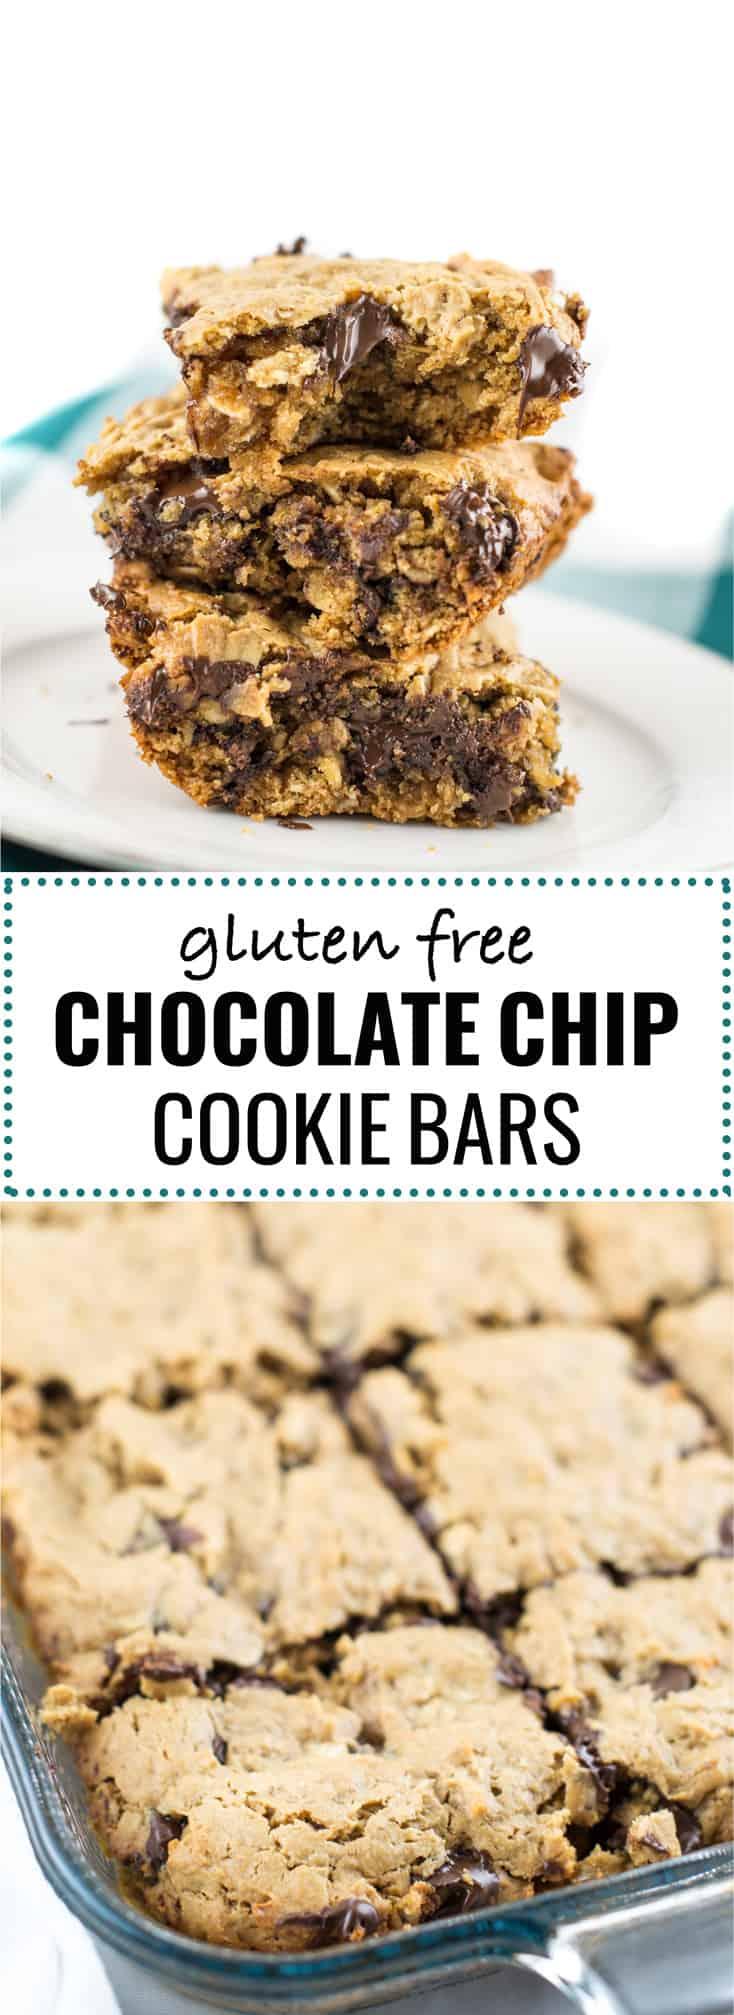 gluten-free oatmeal chocolate chip bars #glutenfree #glutenfreedessert #cookiebars #healthydessert